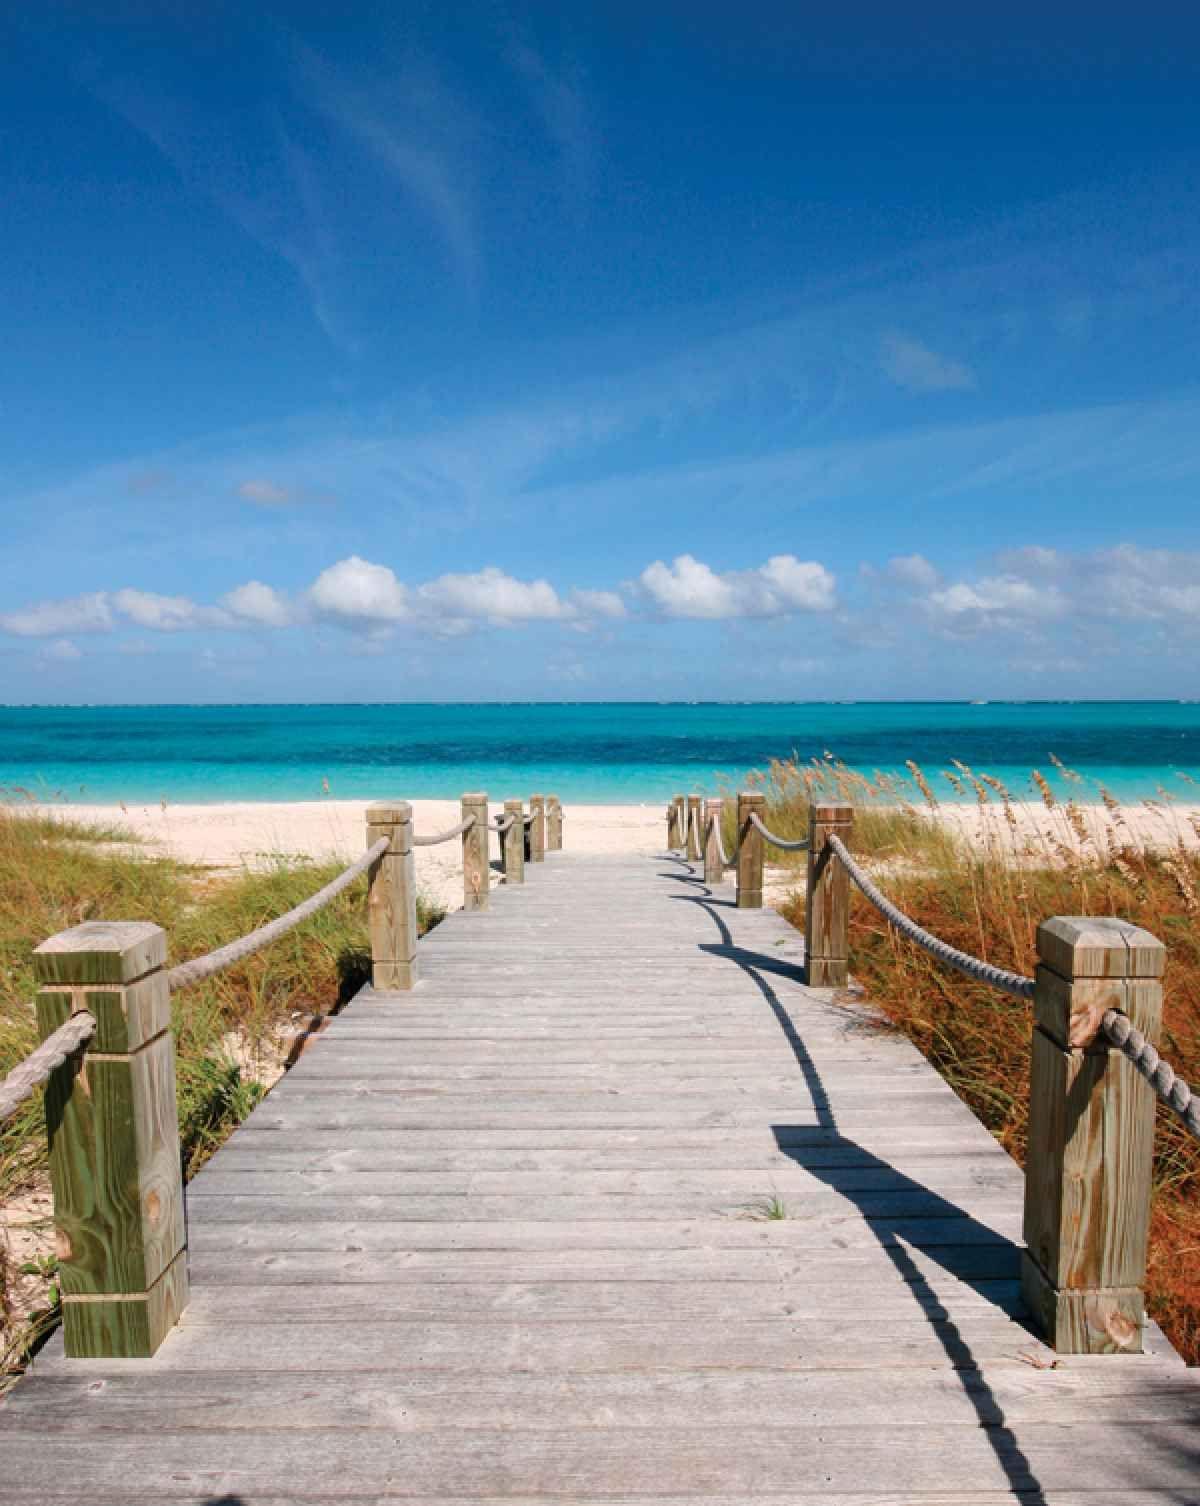 Beaches Turks, Caicos, Grace